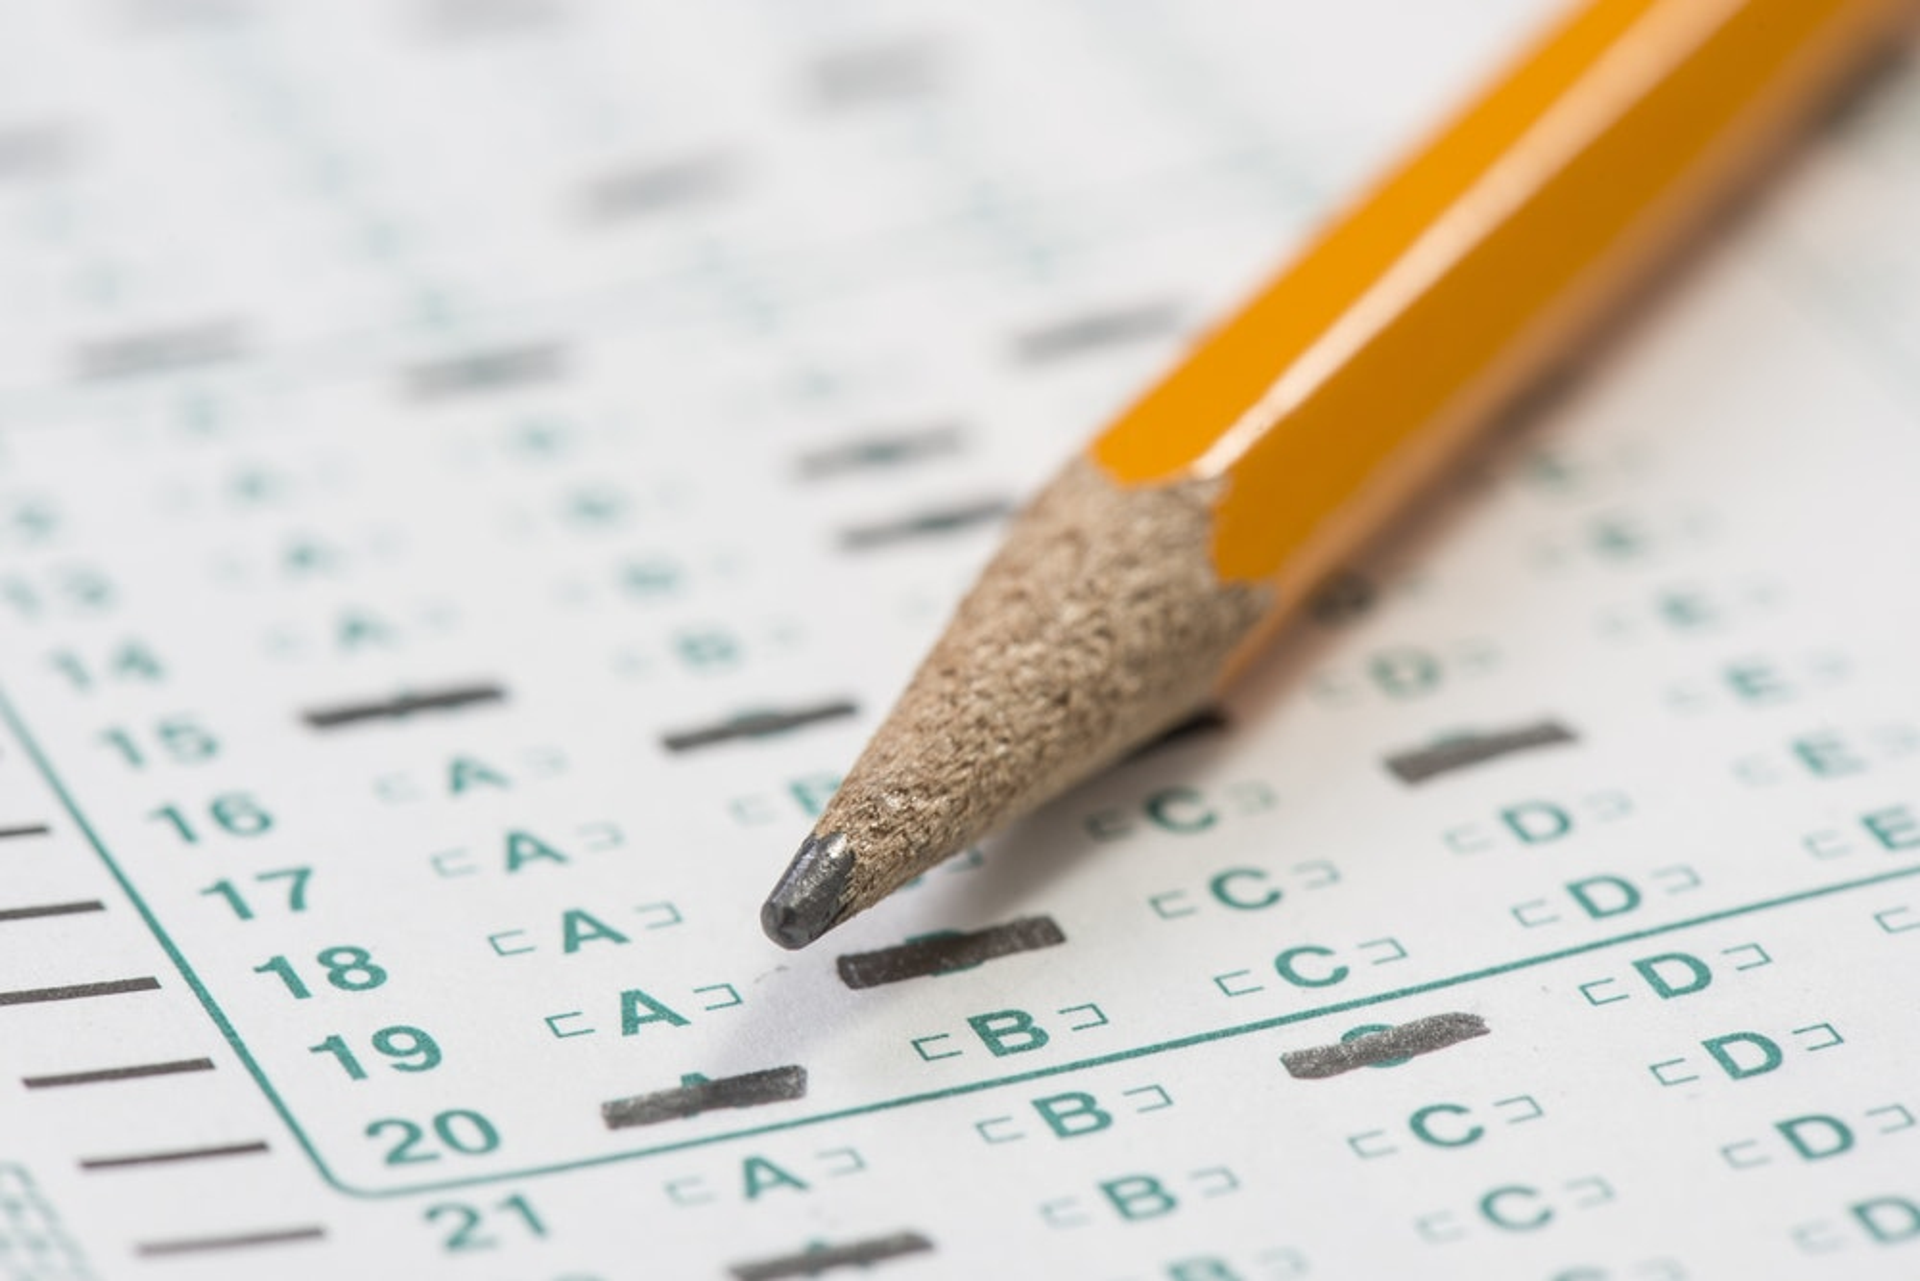 Mature age tertiary entrance examination